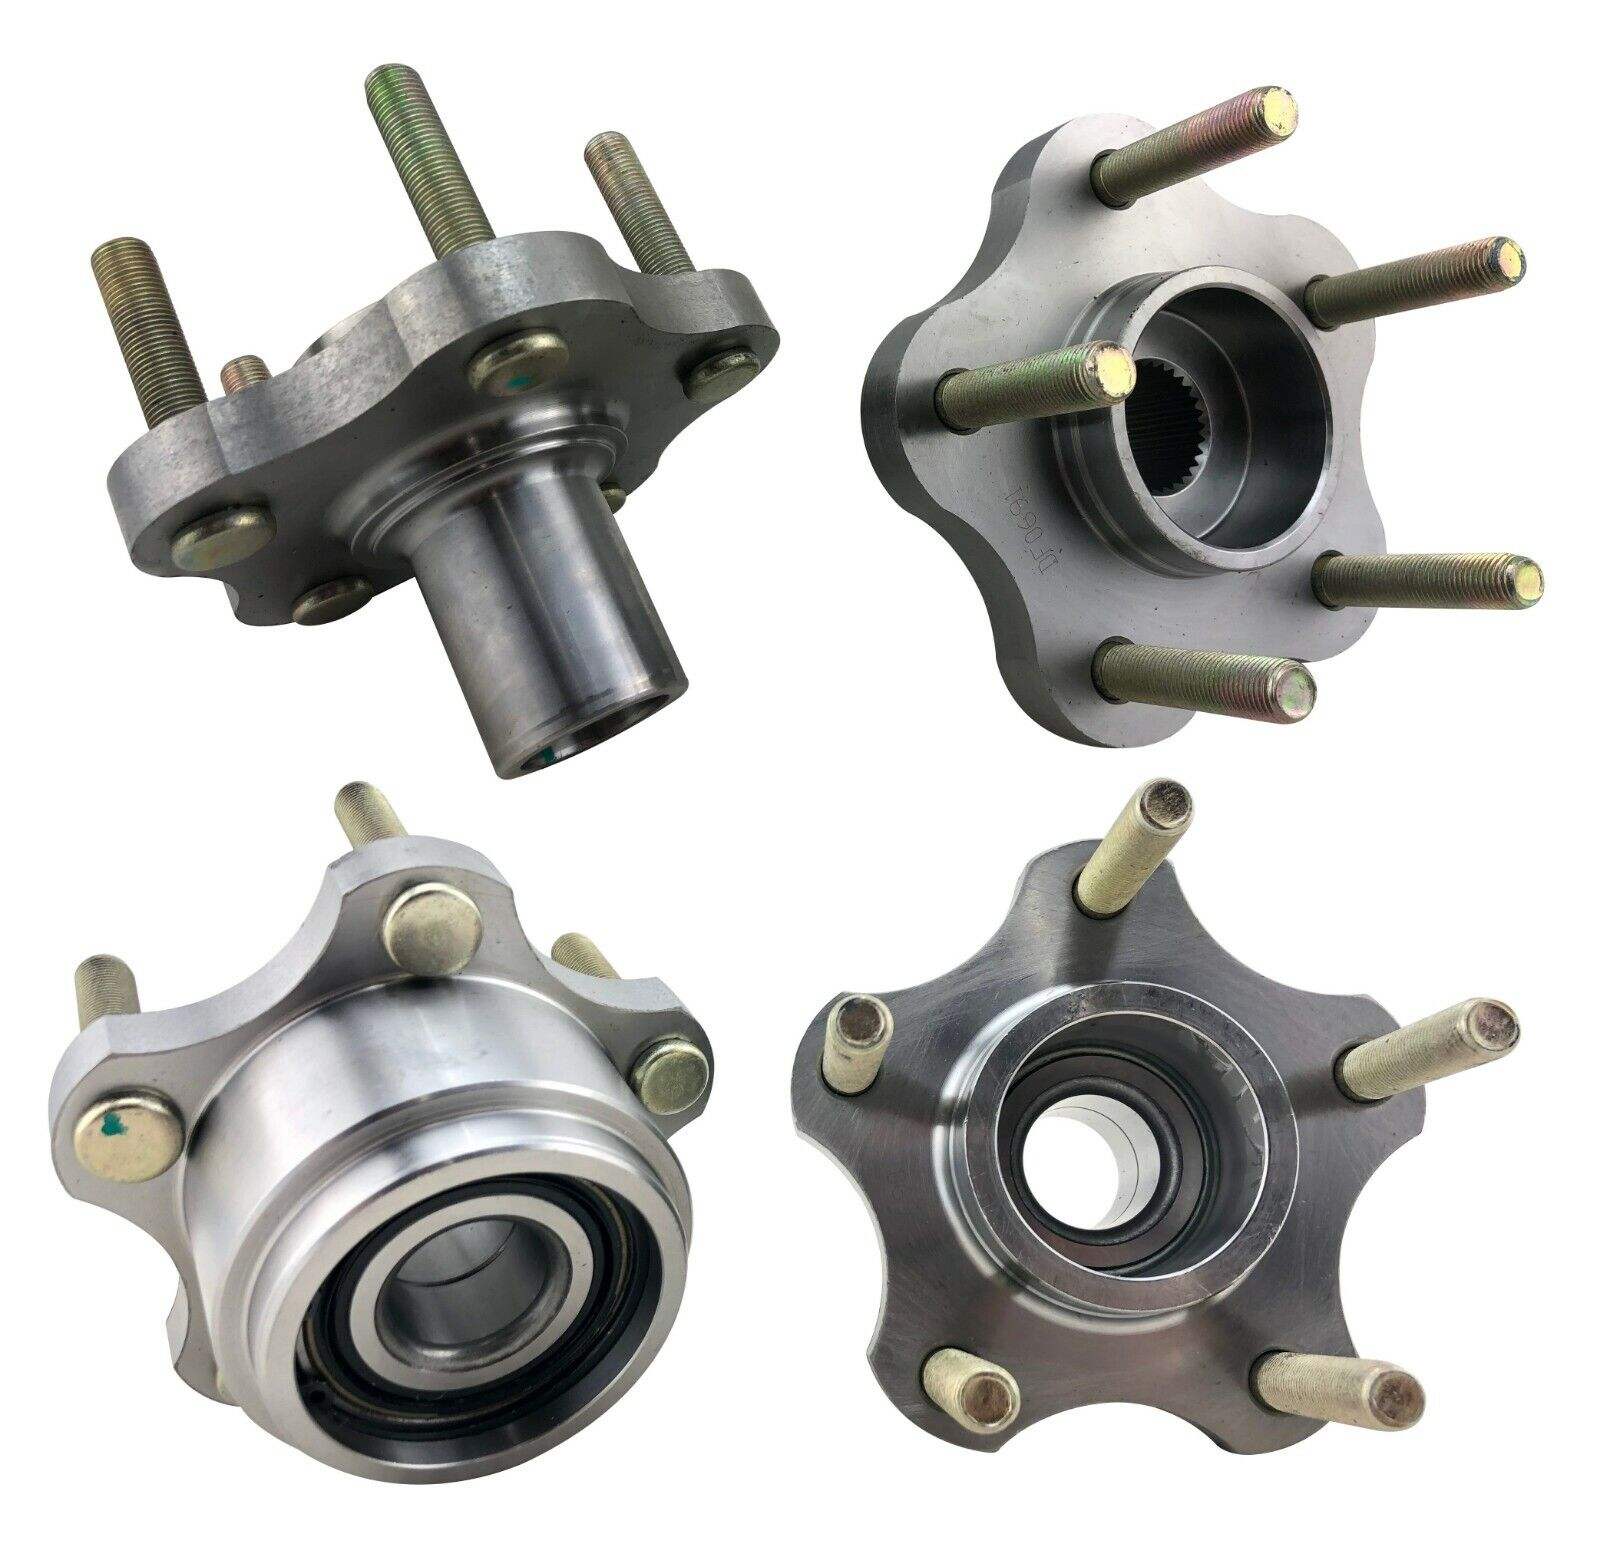 5 Lug Wheel Hub Conversion w//Bearing 4x114.3 to 5x114.3 for 1989-1994 S13 240SX